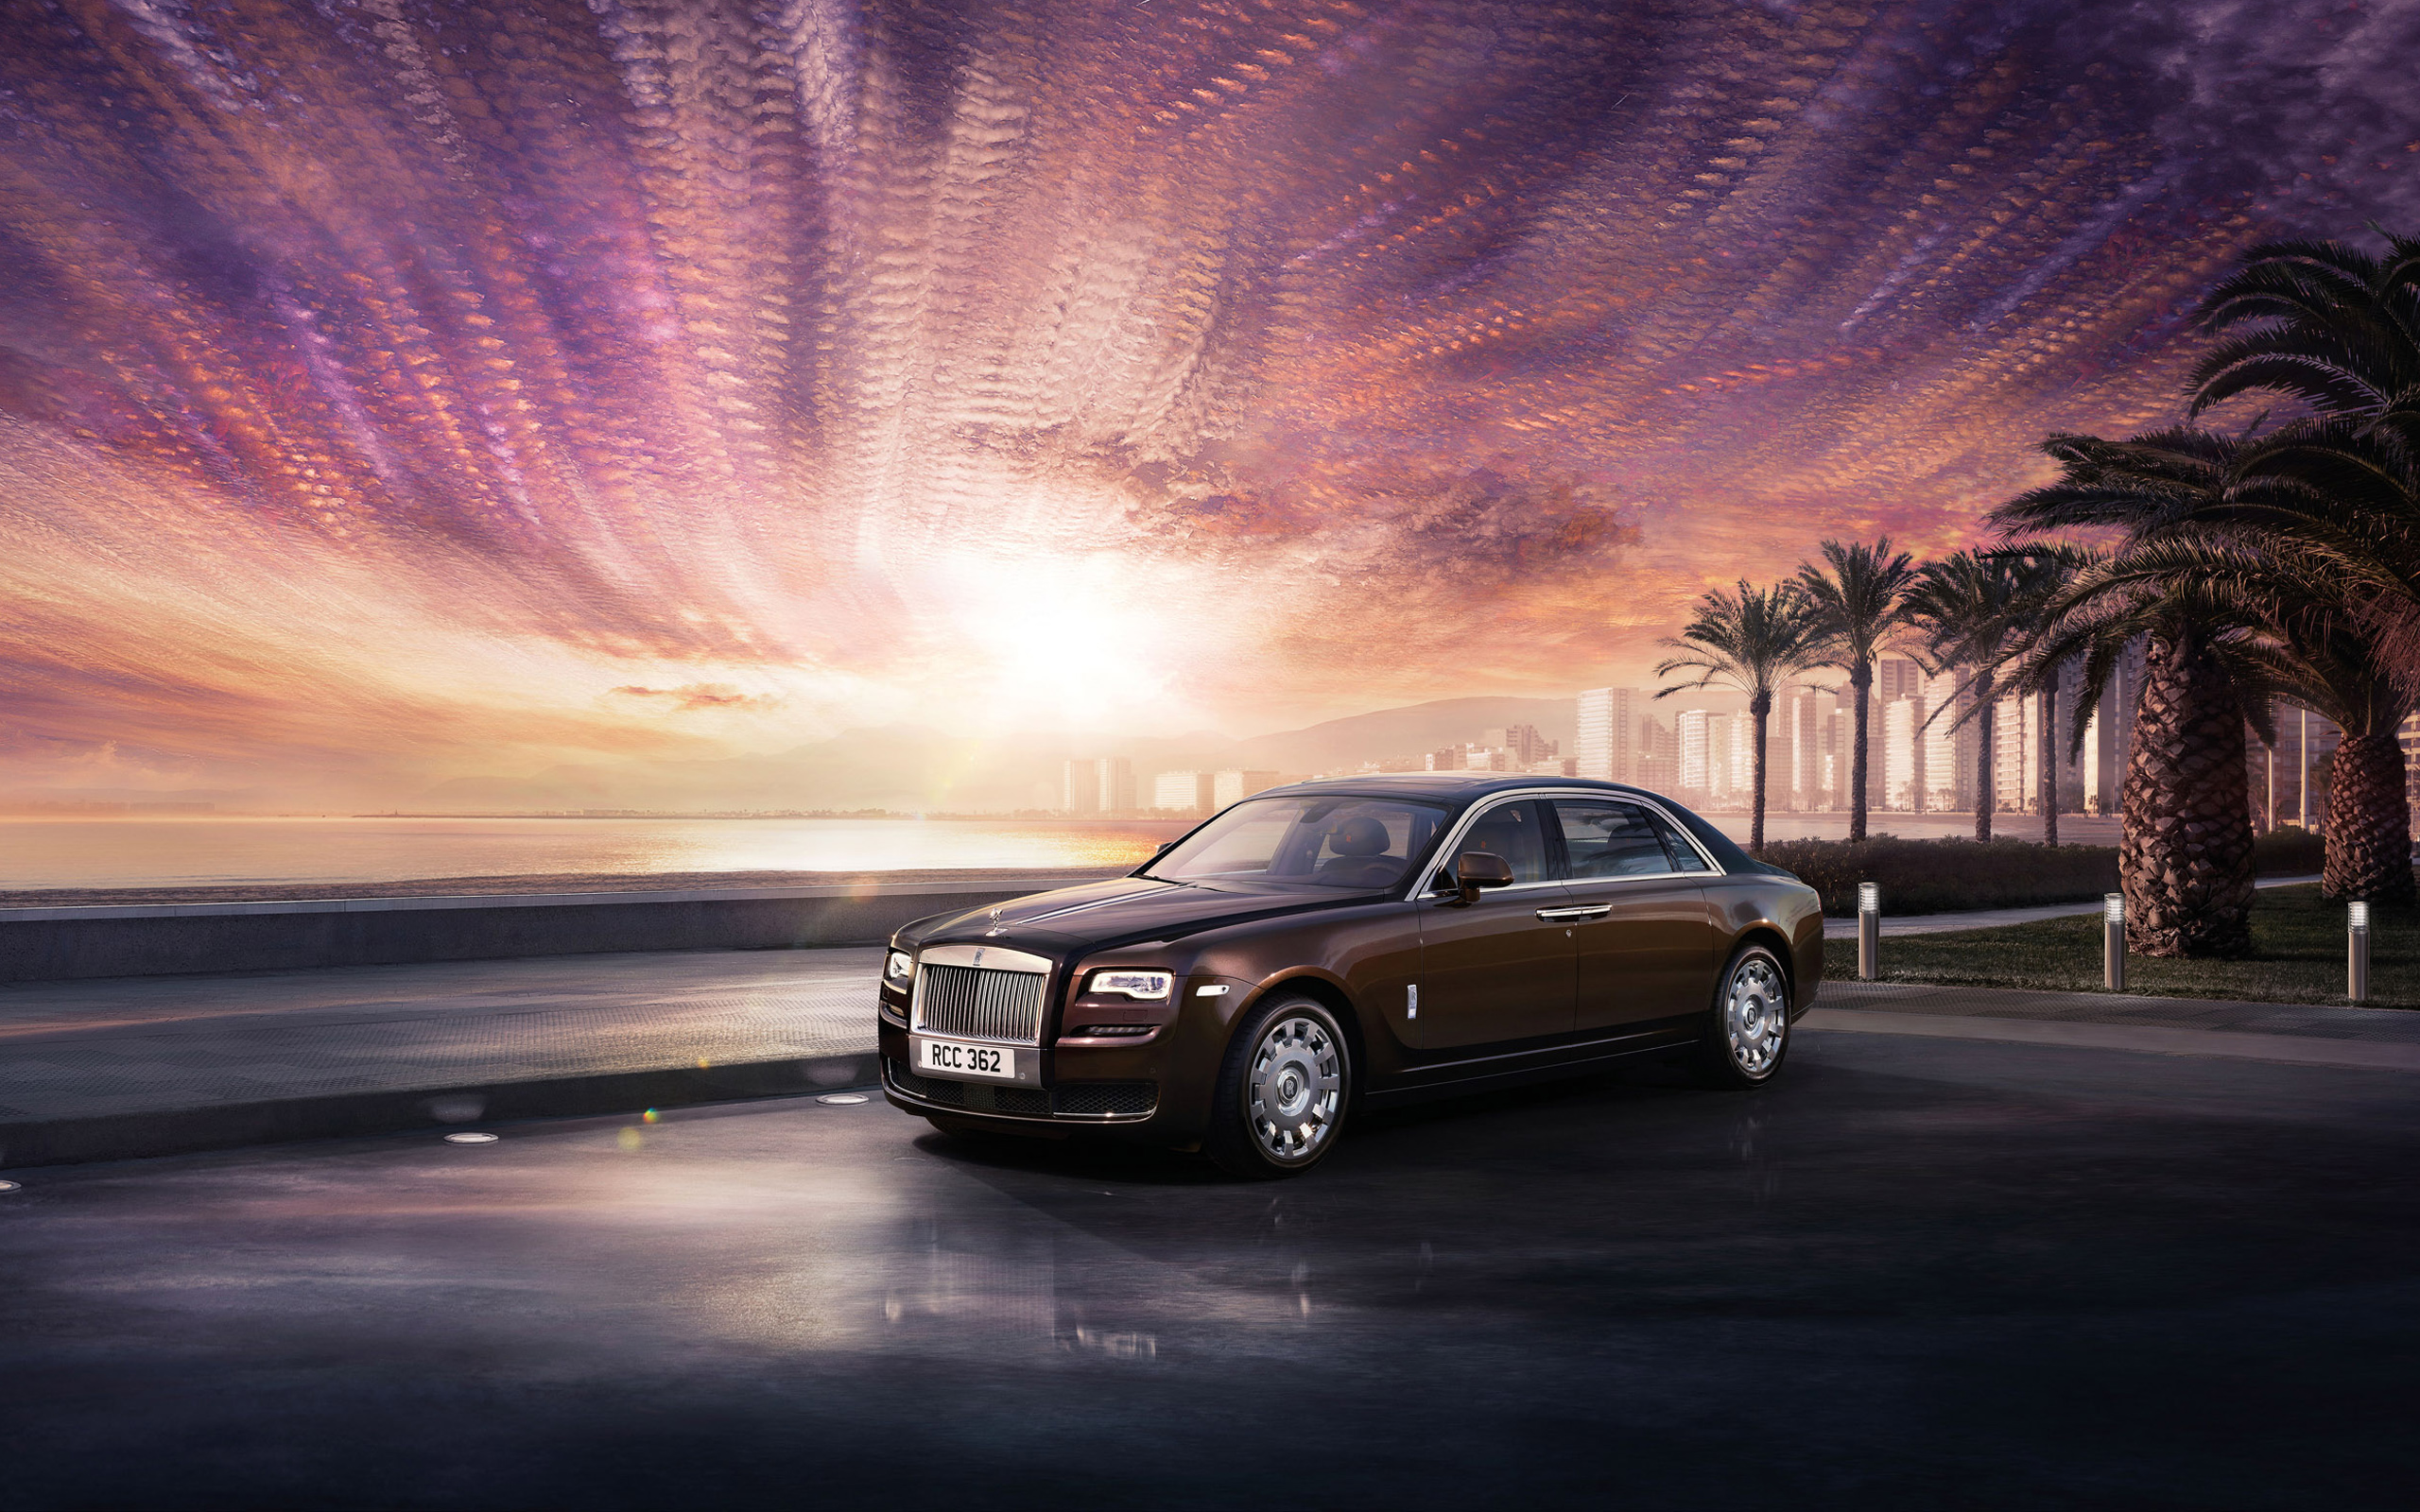 2015 Rolls Royce Ghost Series II Wallpaper HD Car Wallpapers 2560x1600